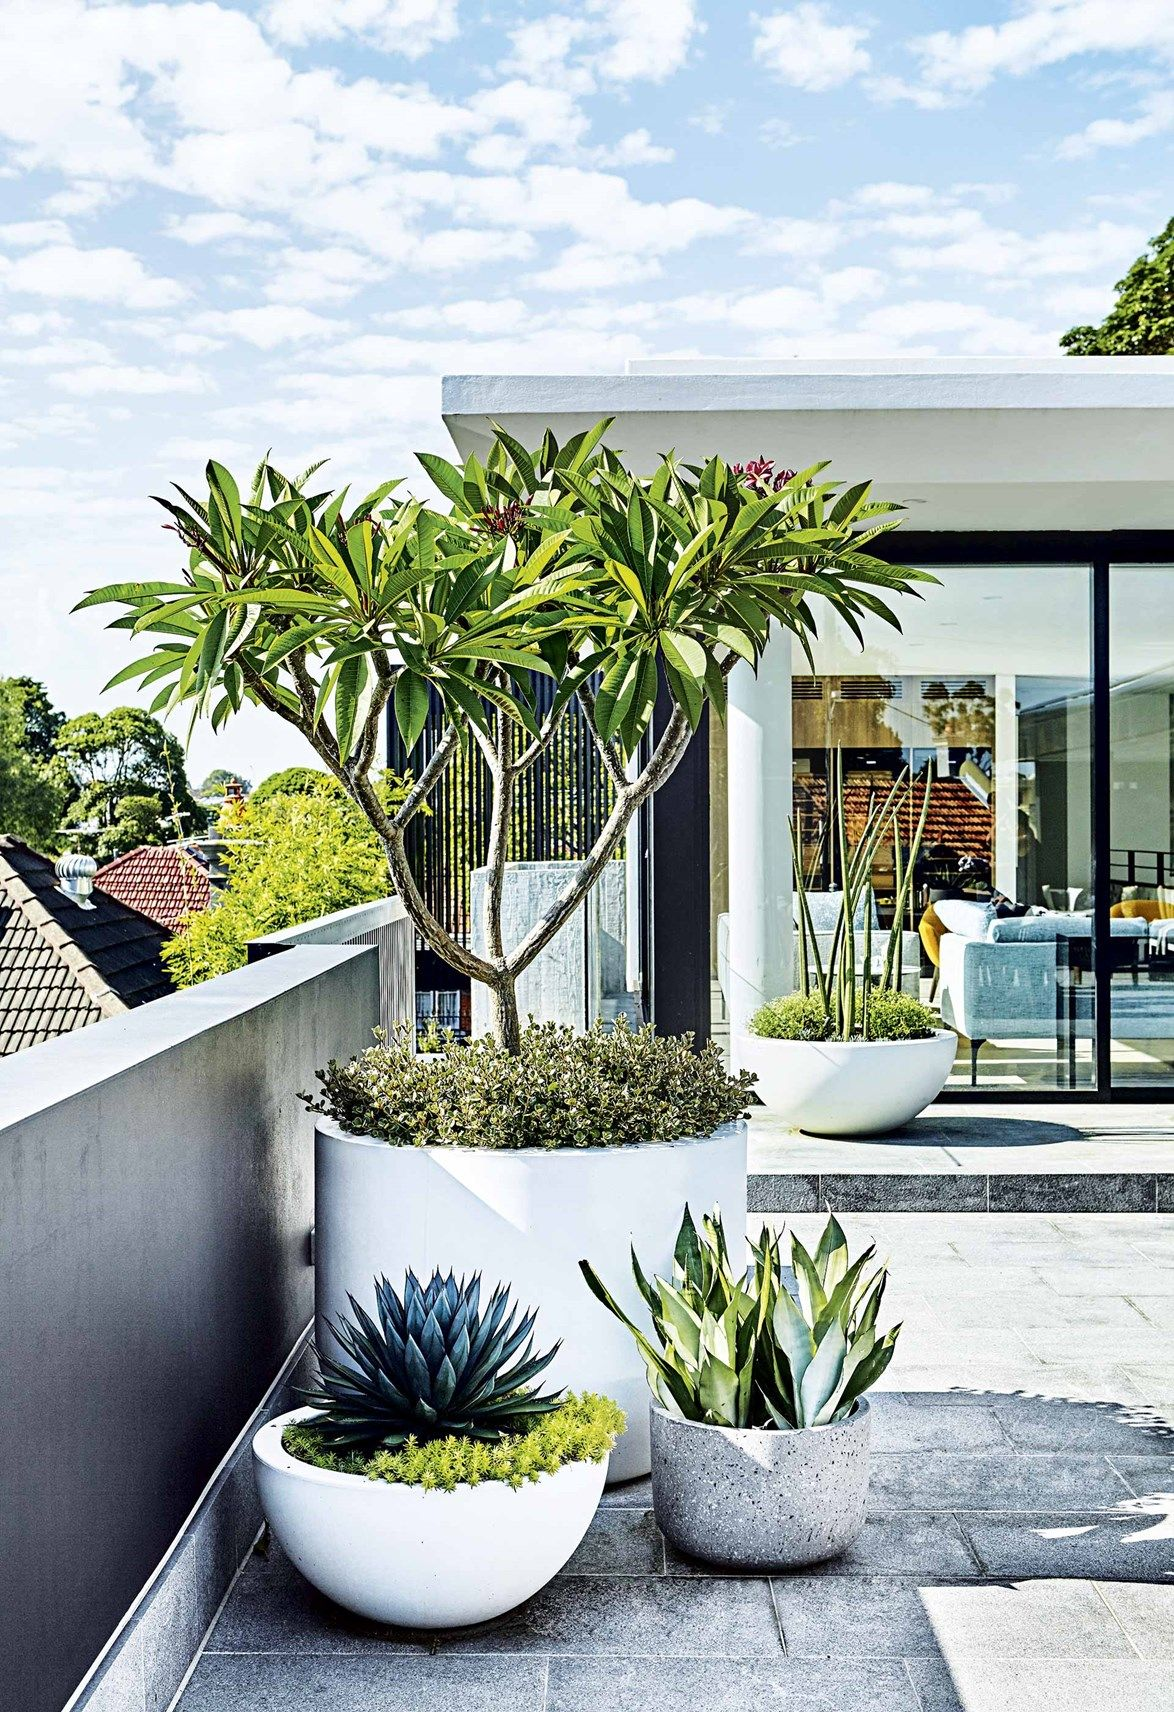 Rooftop Garden 8 Inspiring Rooftop Terrace Ideas In 2020 Modern Planting Small Garden Design Rooftop Terrace Design